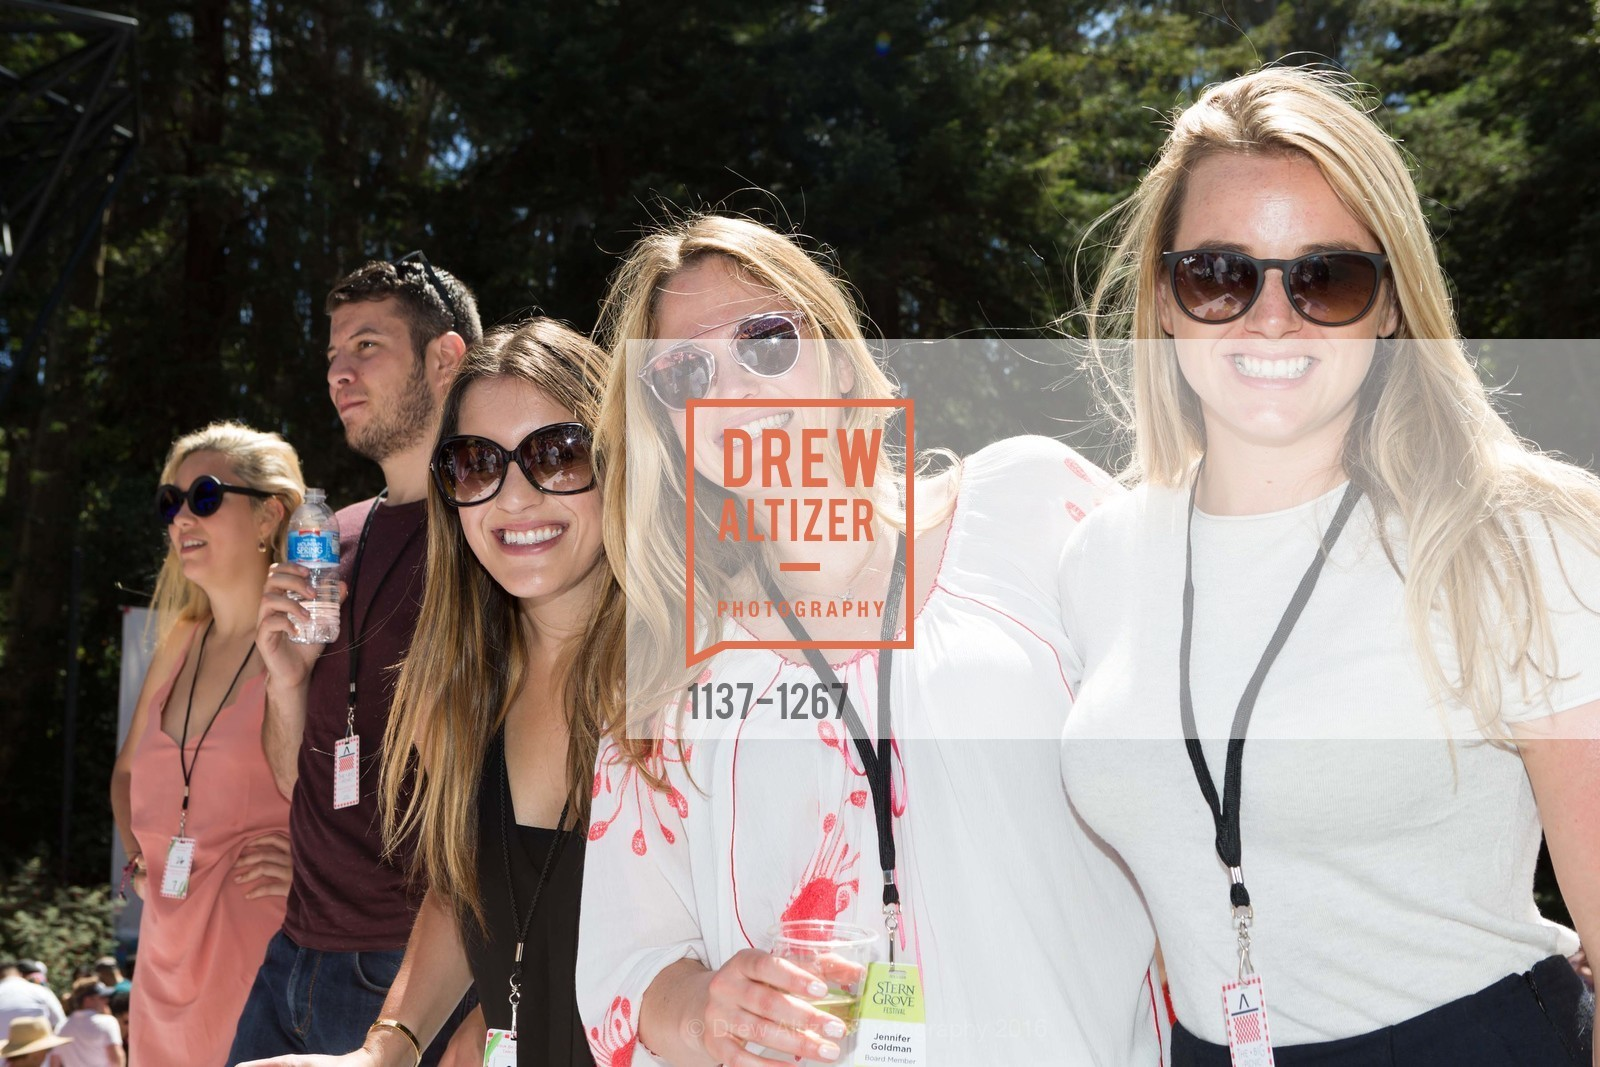 Natalie Mulay, Jennifer Goldman, Katie Ring, Photo #1137-1267